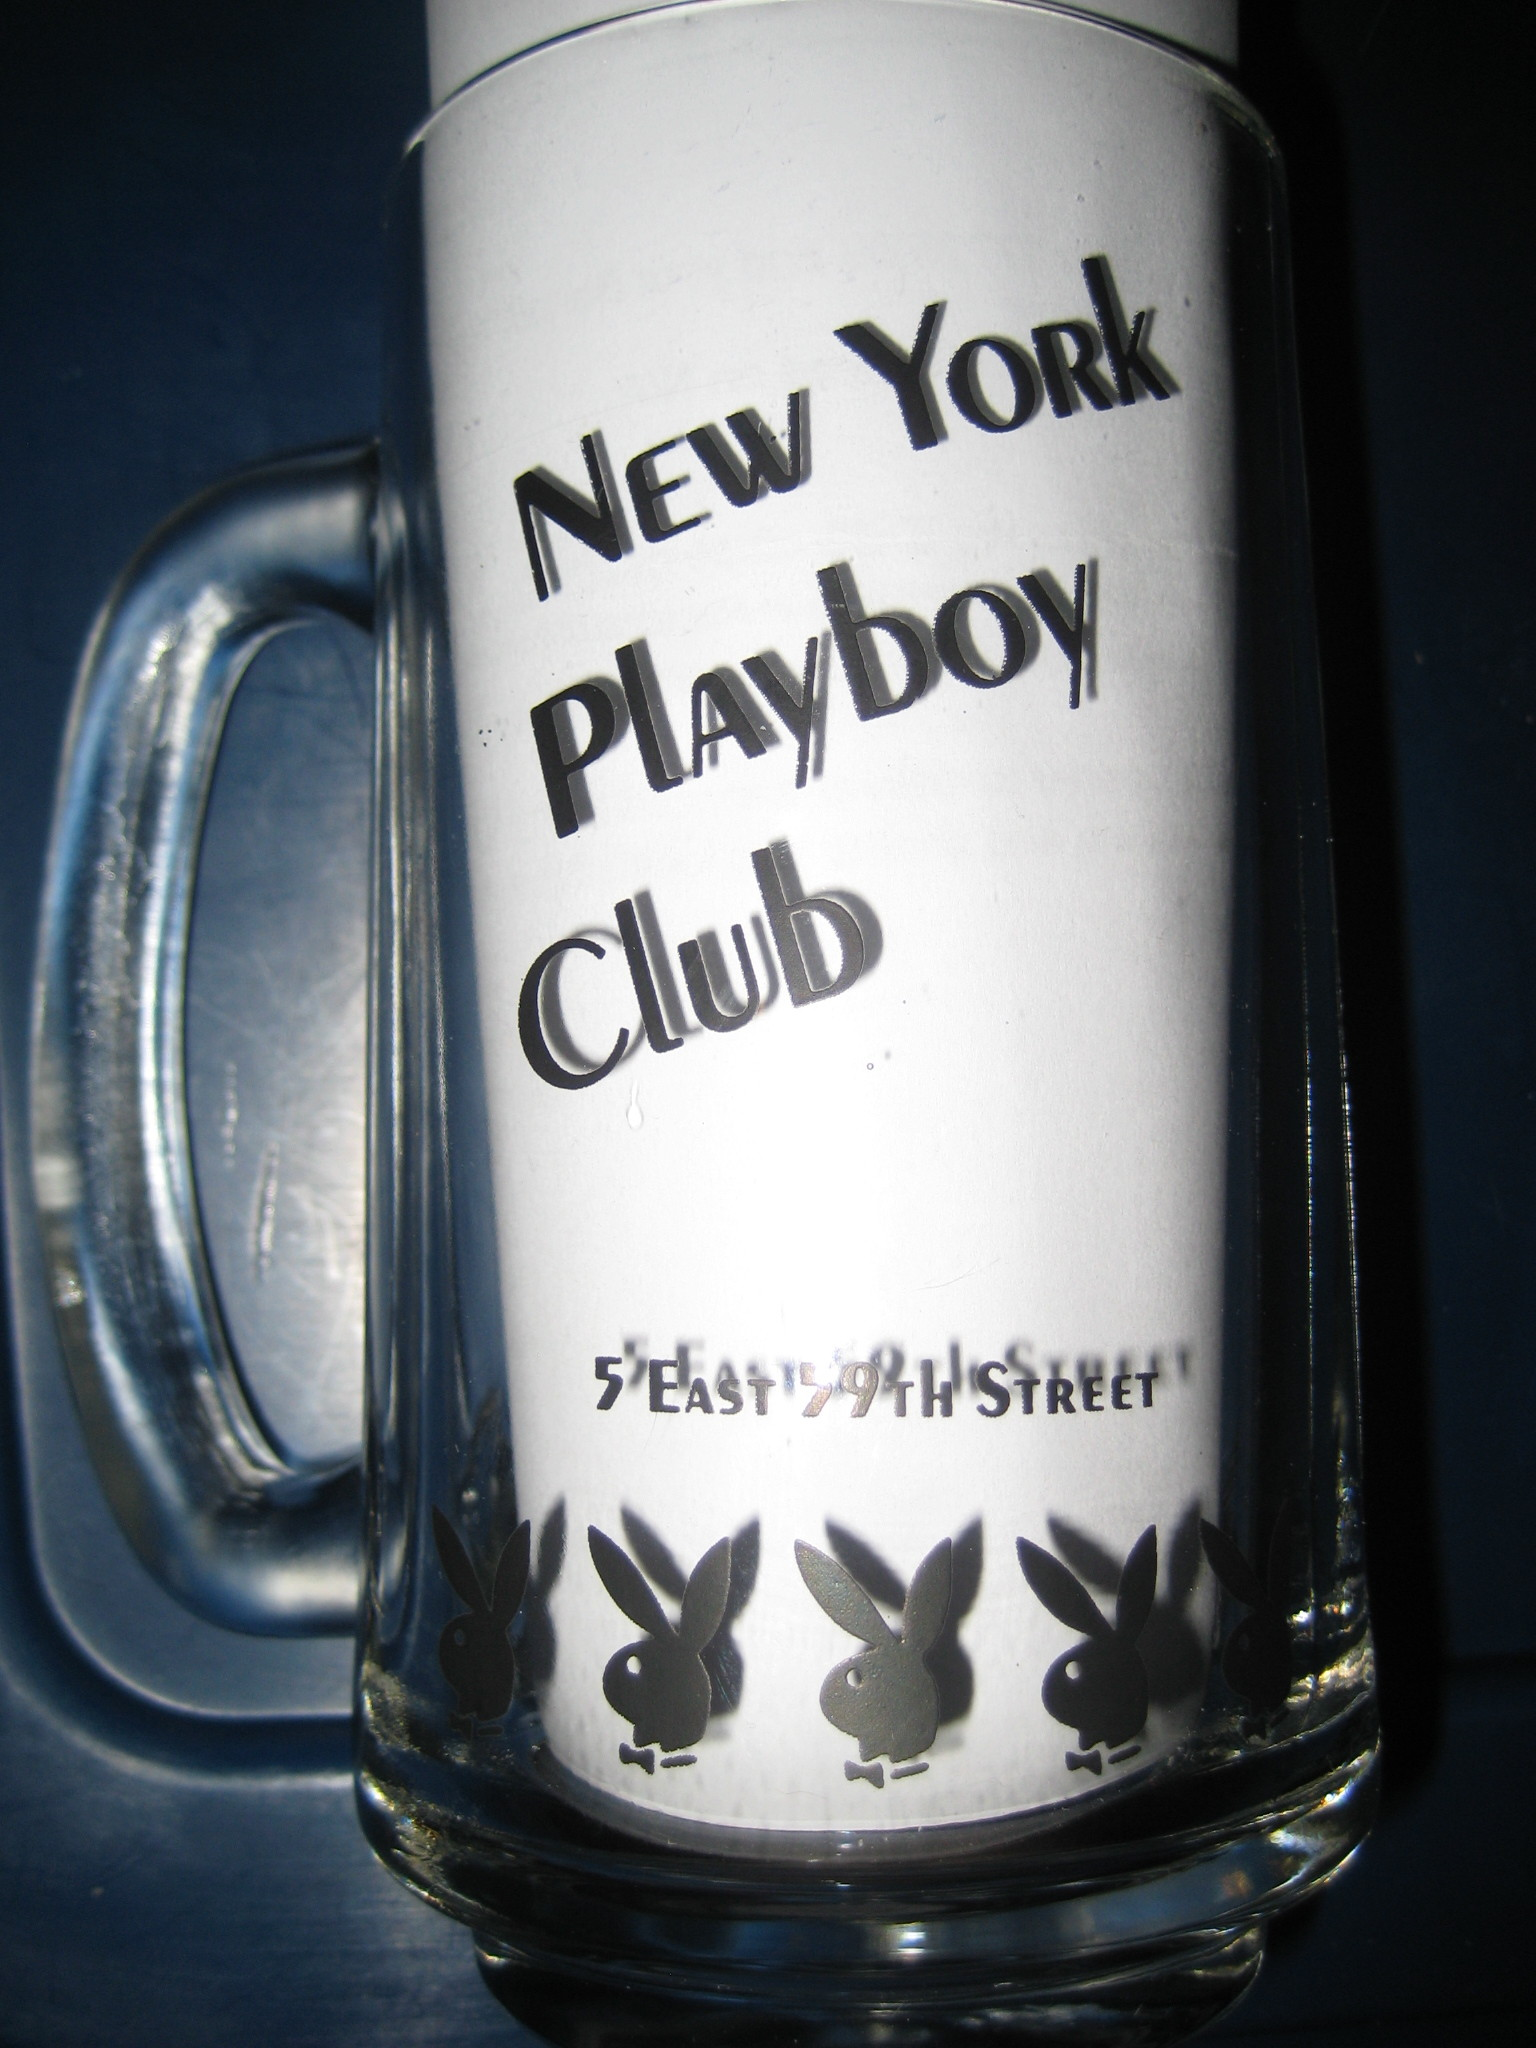 New York Playboy Club Mug